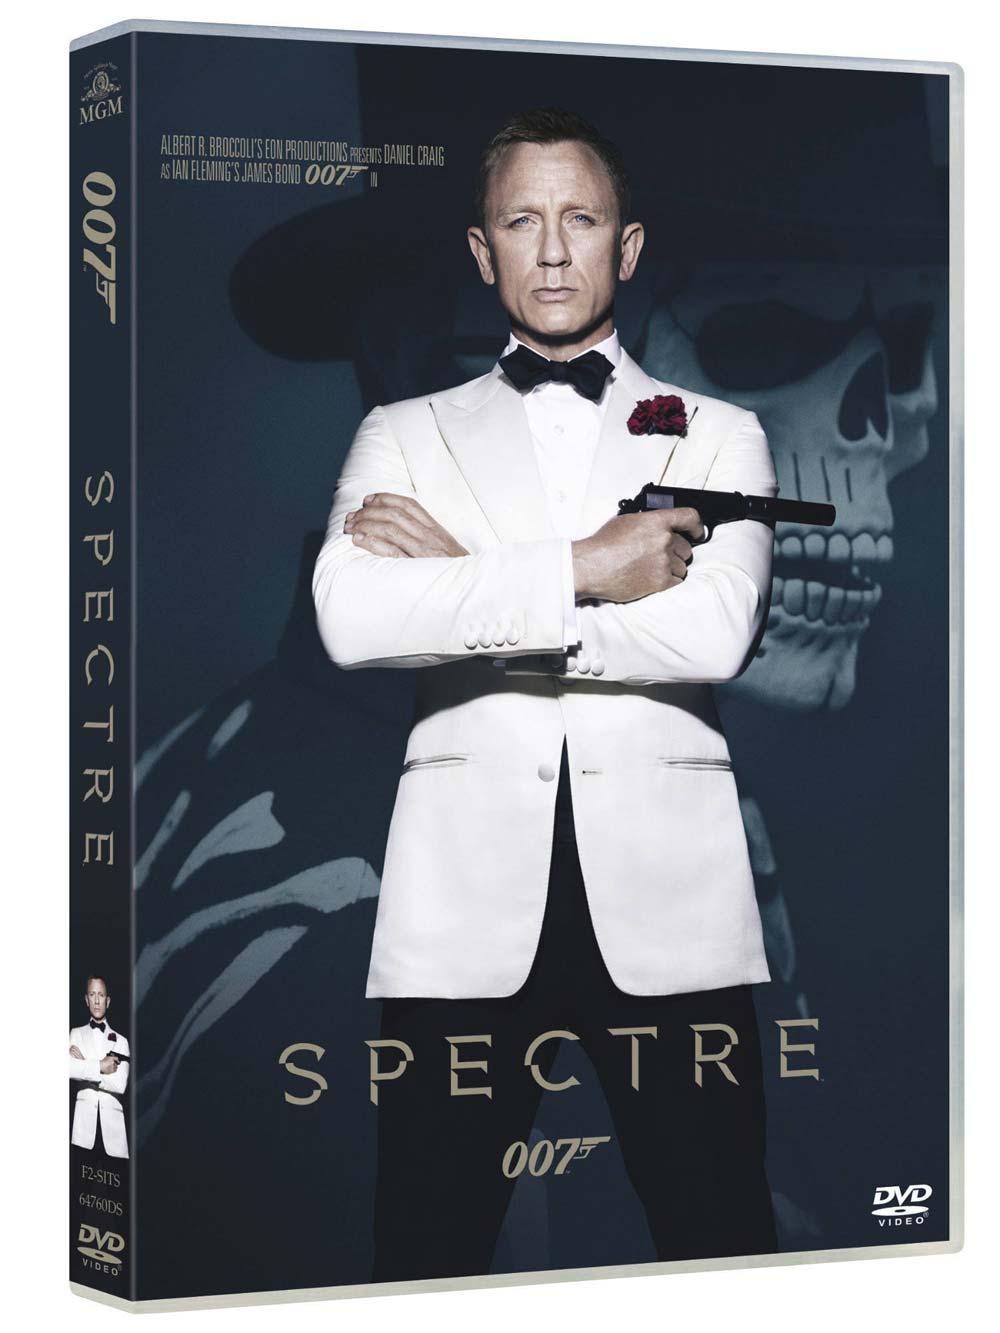 007 - SPECTRE (DVD)